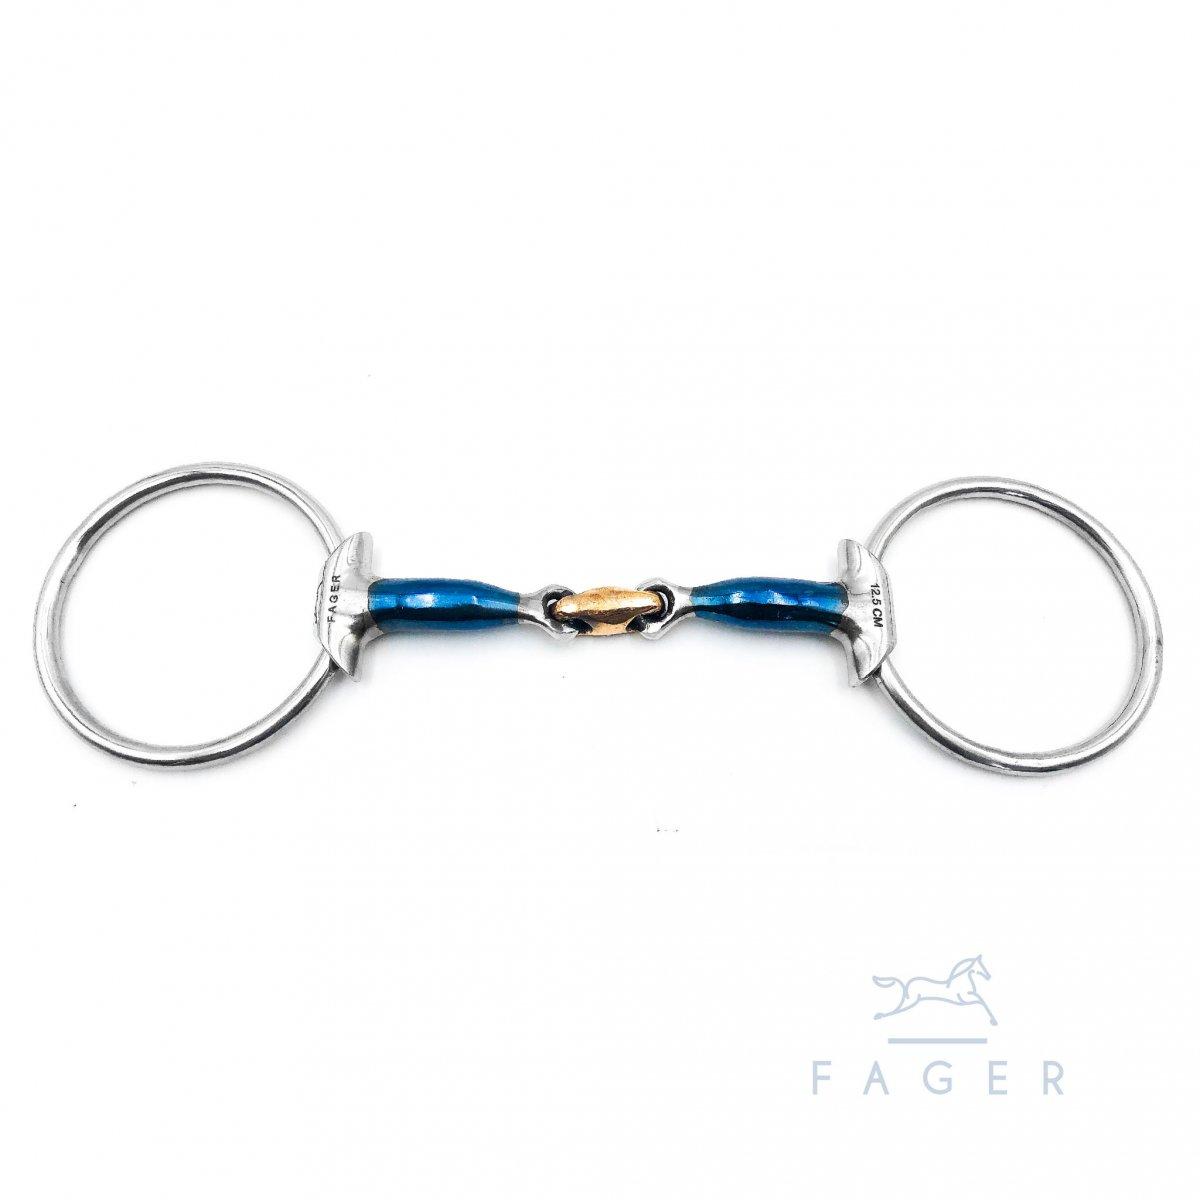 FAGER BITS MARTIN fagers-smart-lock-fss-wings-bett